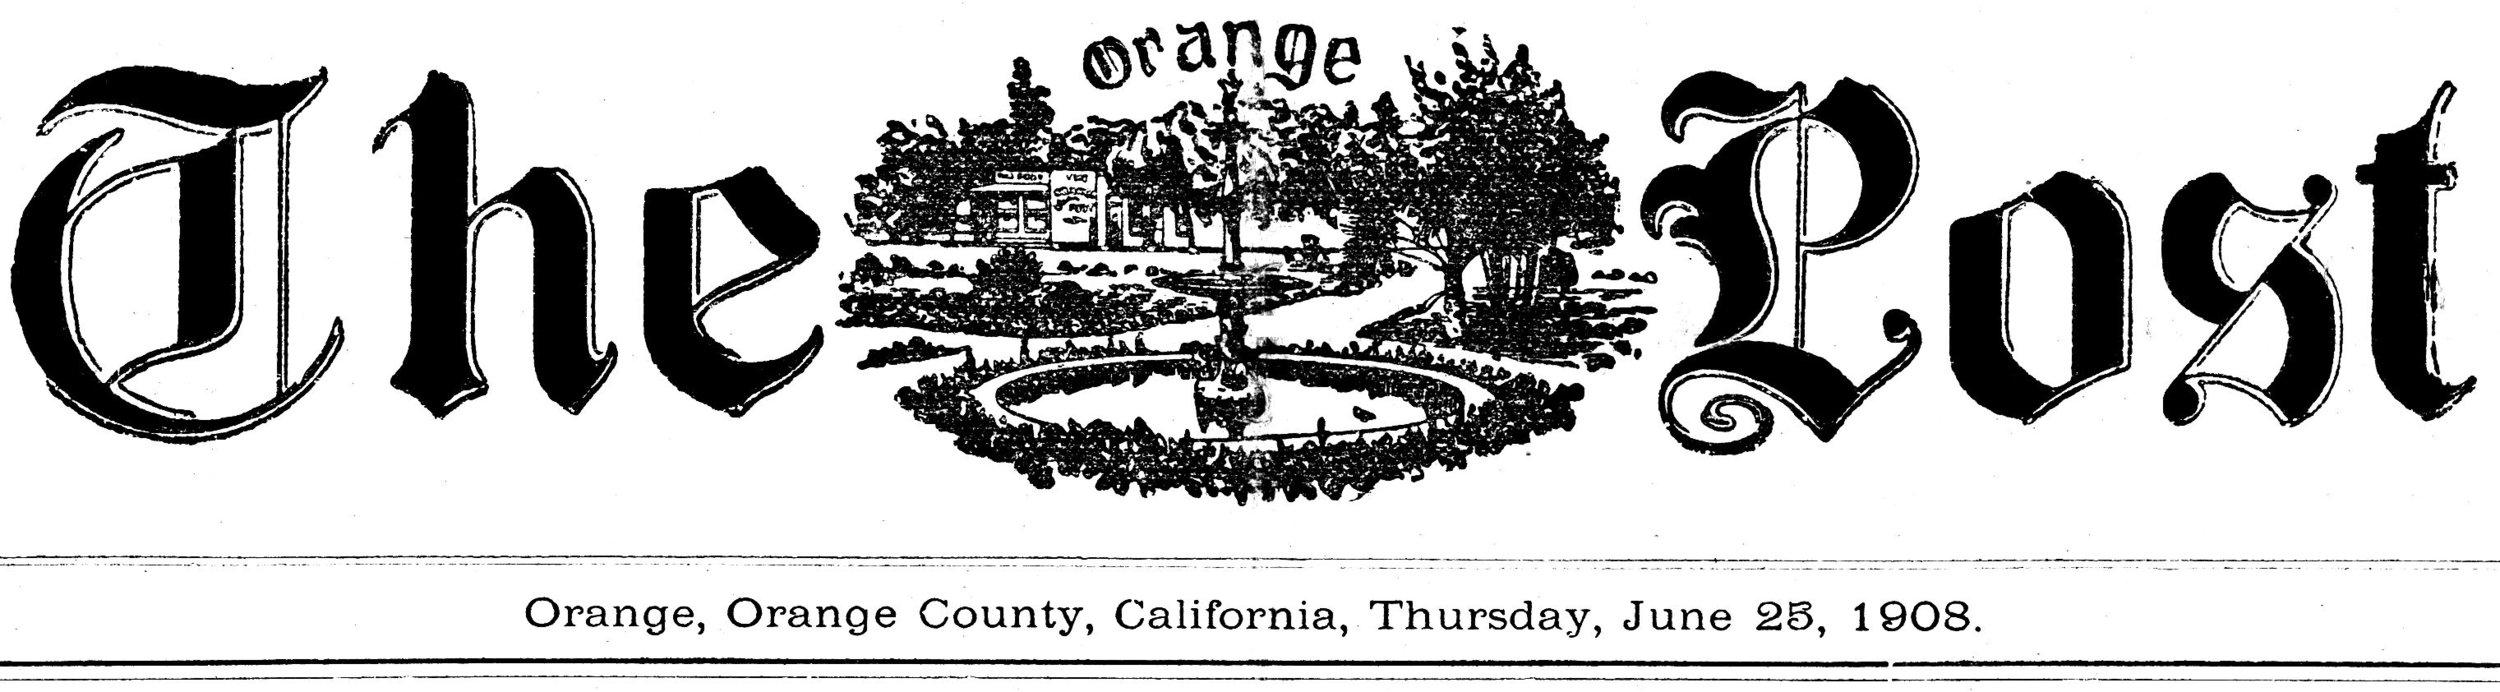 Orange Post 1908.jpg